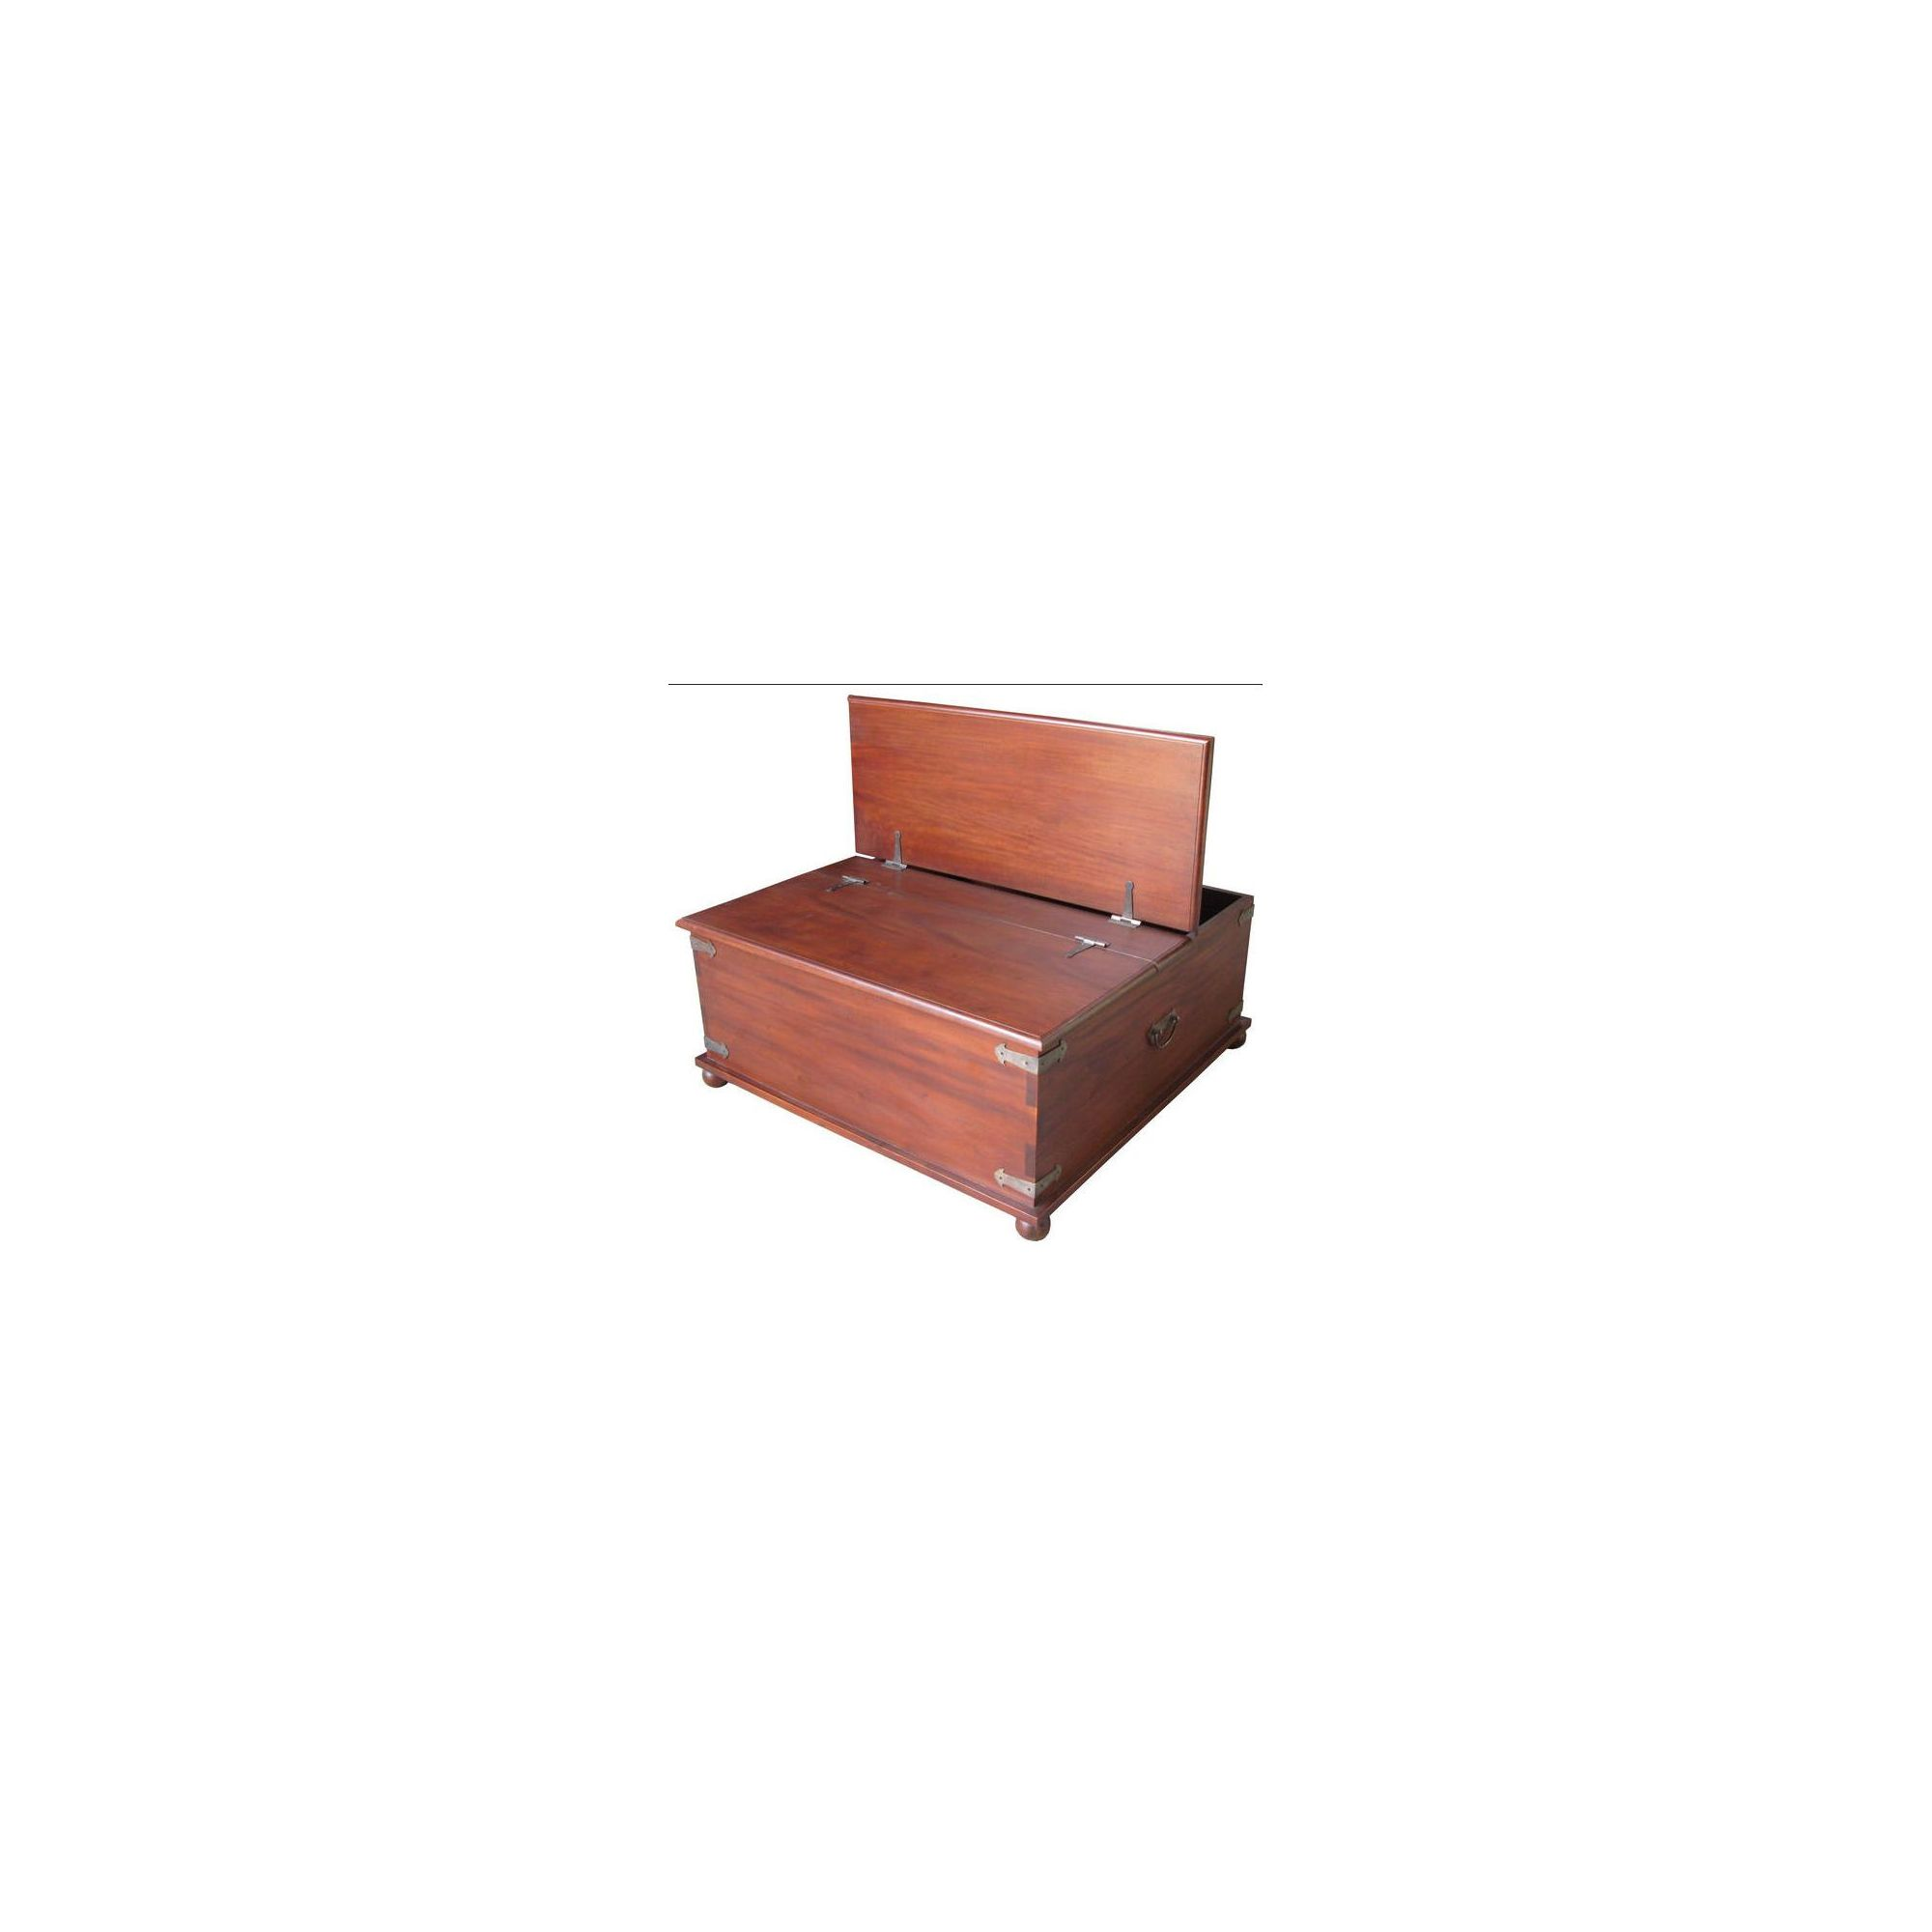 Lock stock and barrel Mahogany Vintage Trunk Table in Mahogany at Tesco Direct